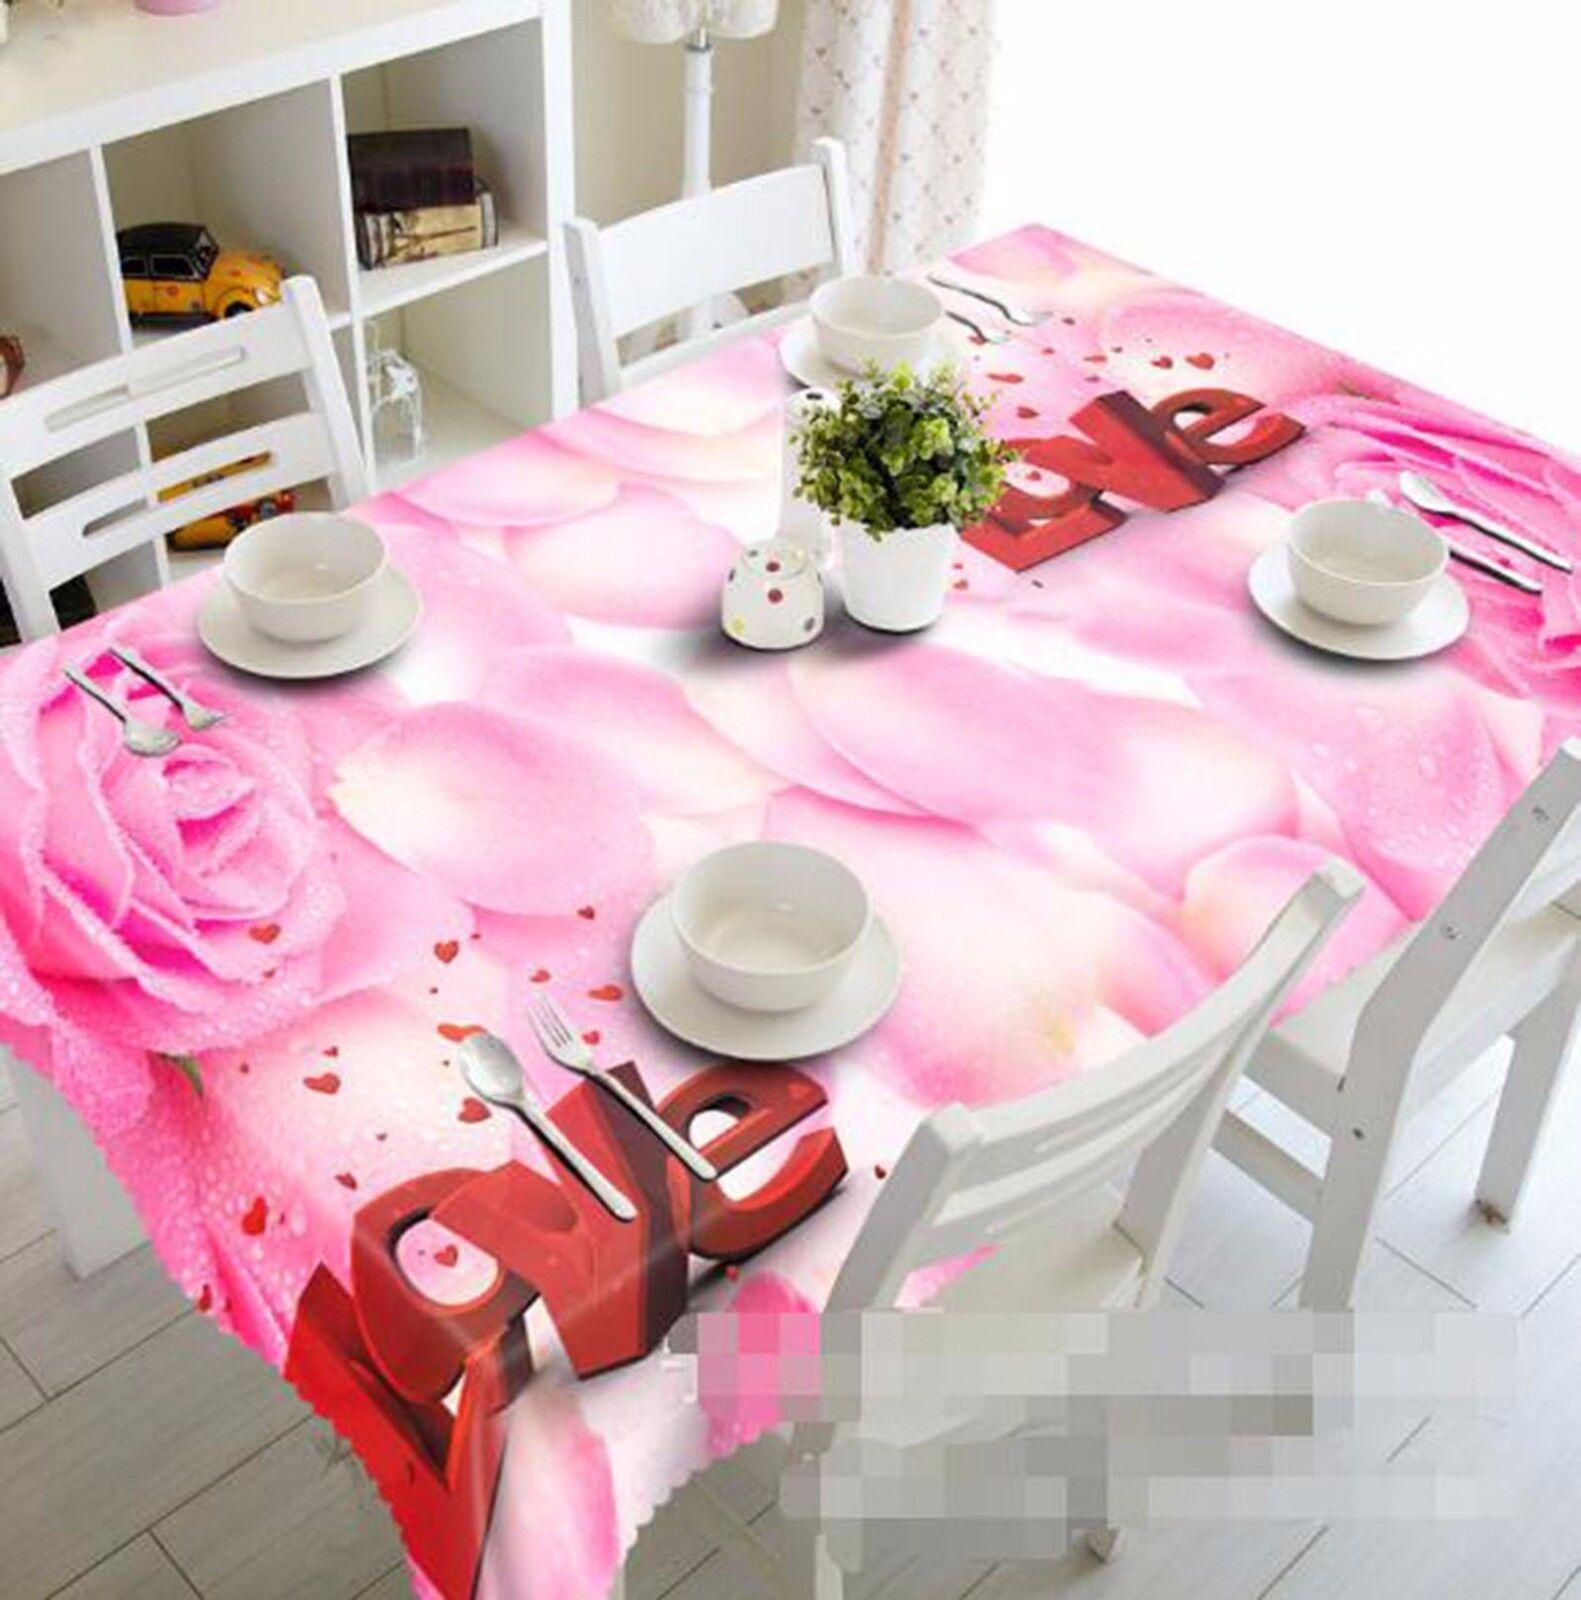 3D Petals 415 Tablecloth Table Cover Cloth Birthday Party AJ WALLPAPER UK Lemon